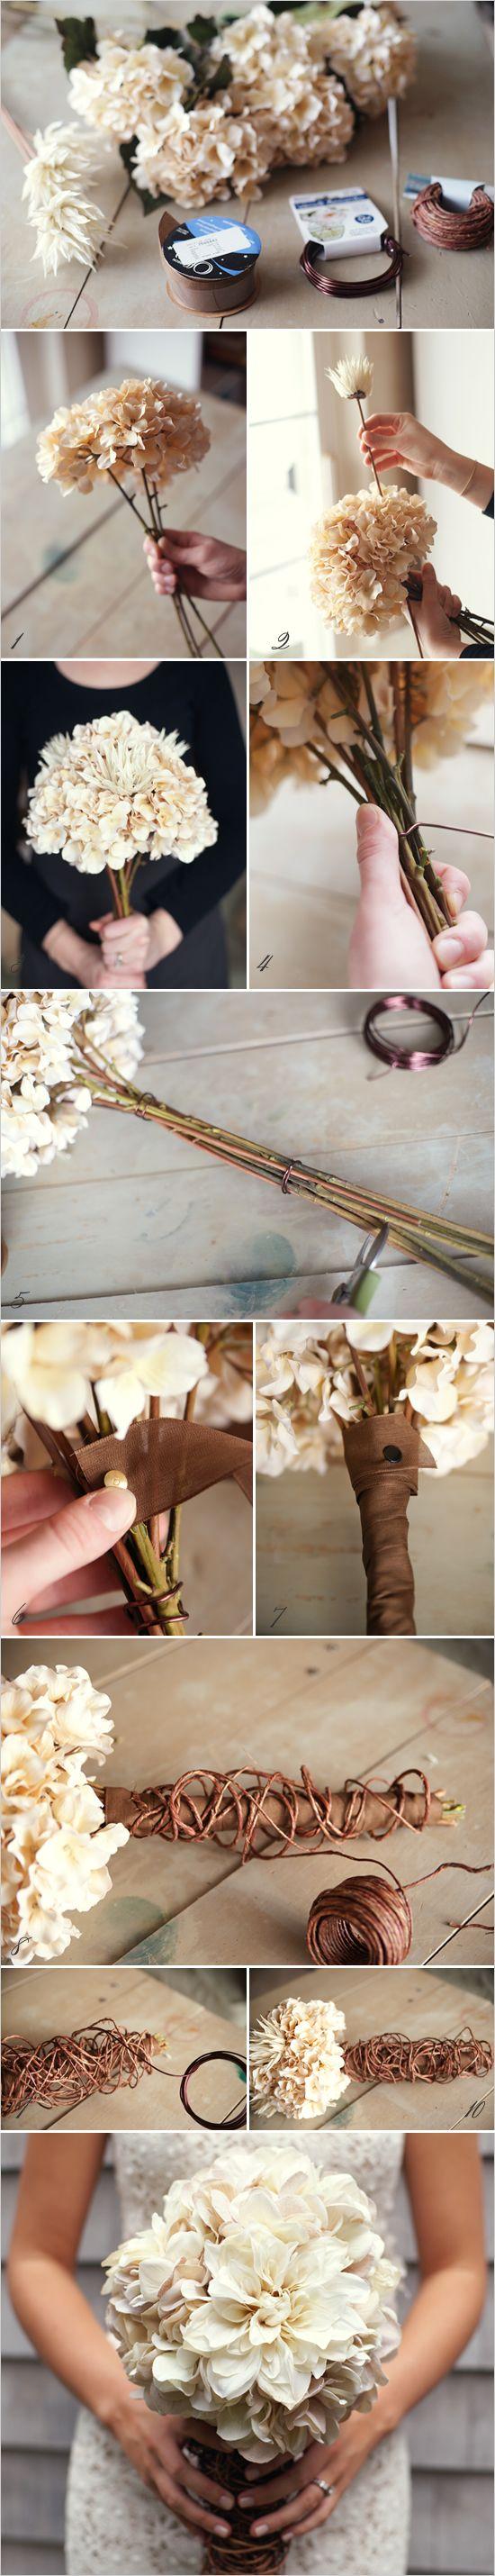 diy bridal bouquet...hydrangeas...or peonies: Wedding Bouquets, Wedding Ideas, Mum Bouquet, Diy Hydrangea, Diy Wedding